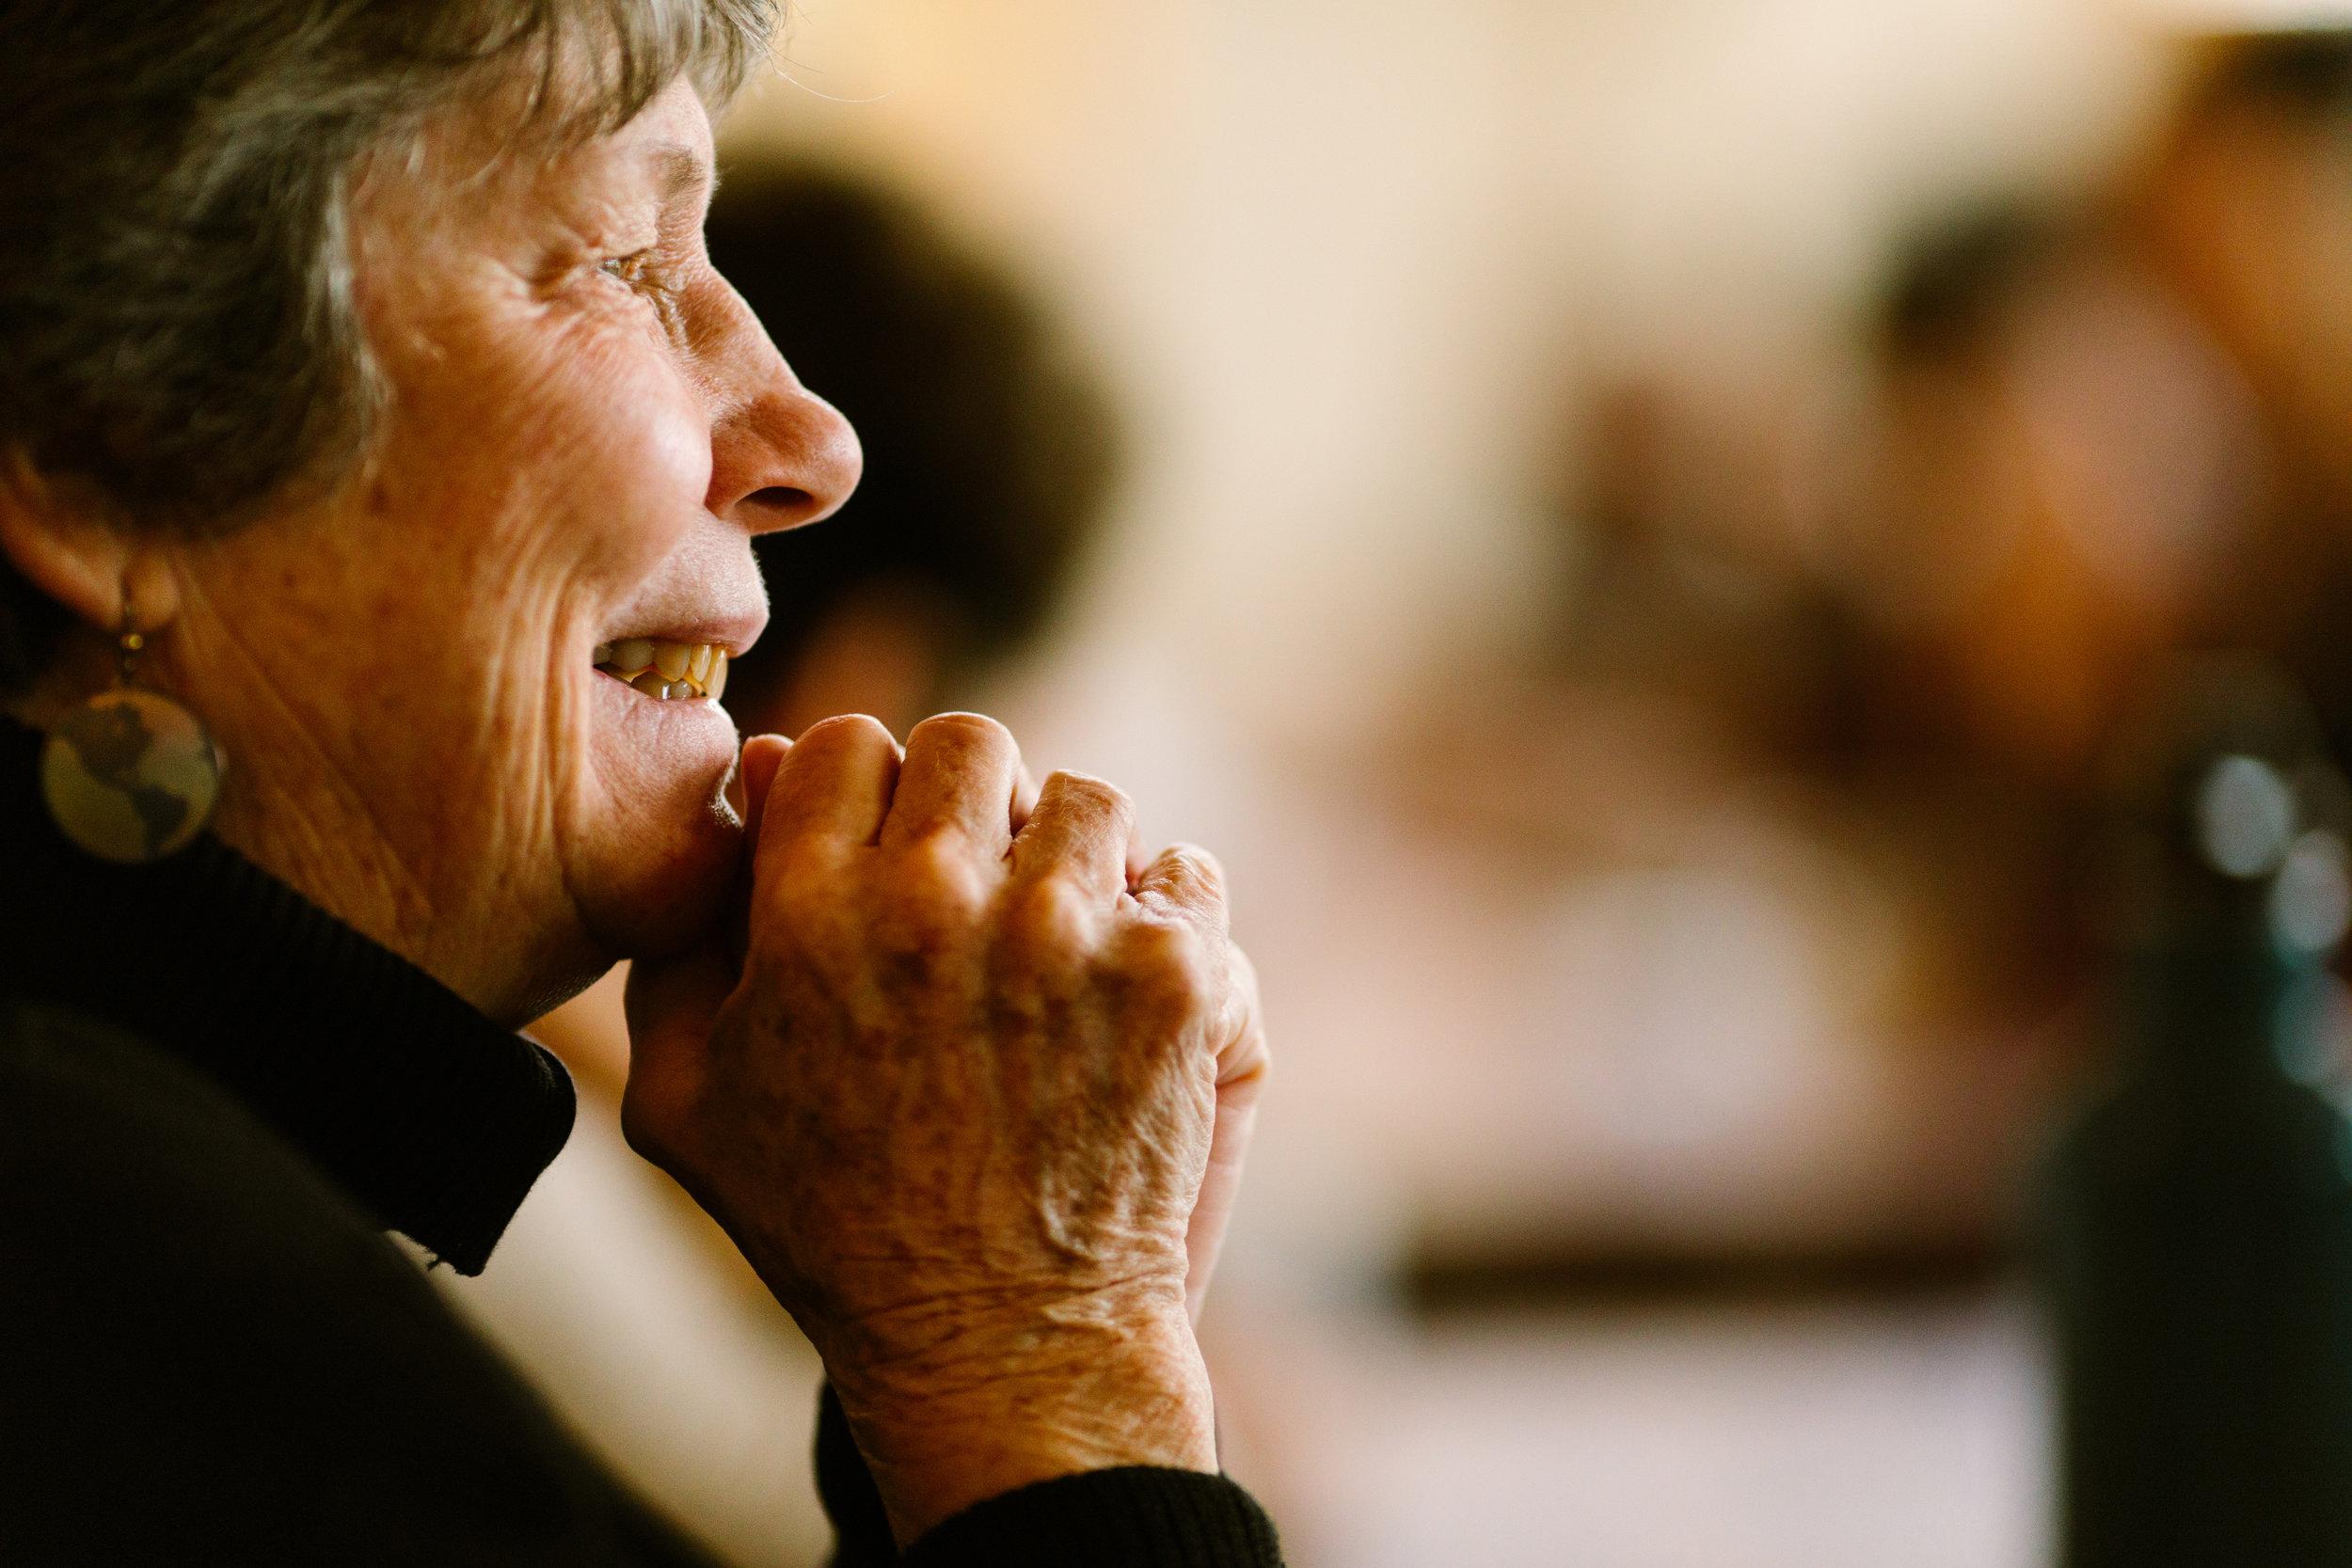 Sr. Judy Carle, Sister of Mercy. Photo by Rhino Media.